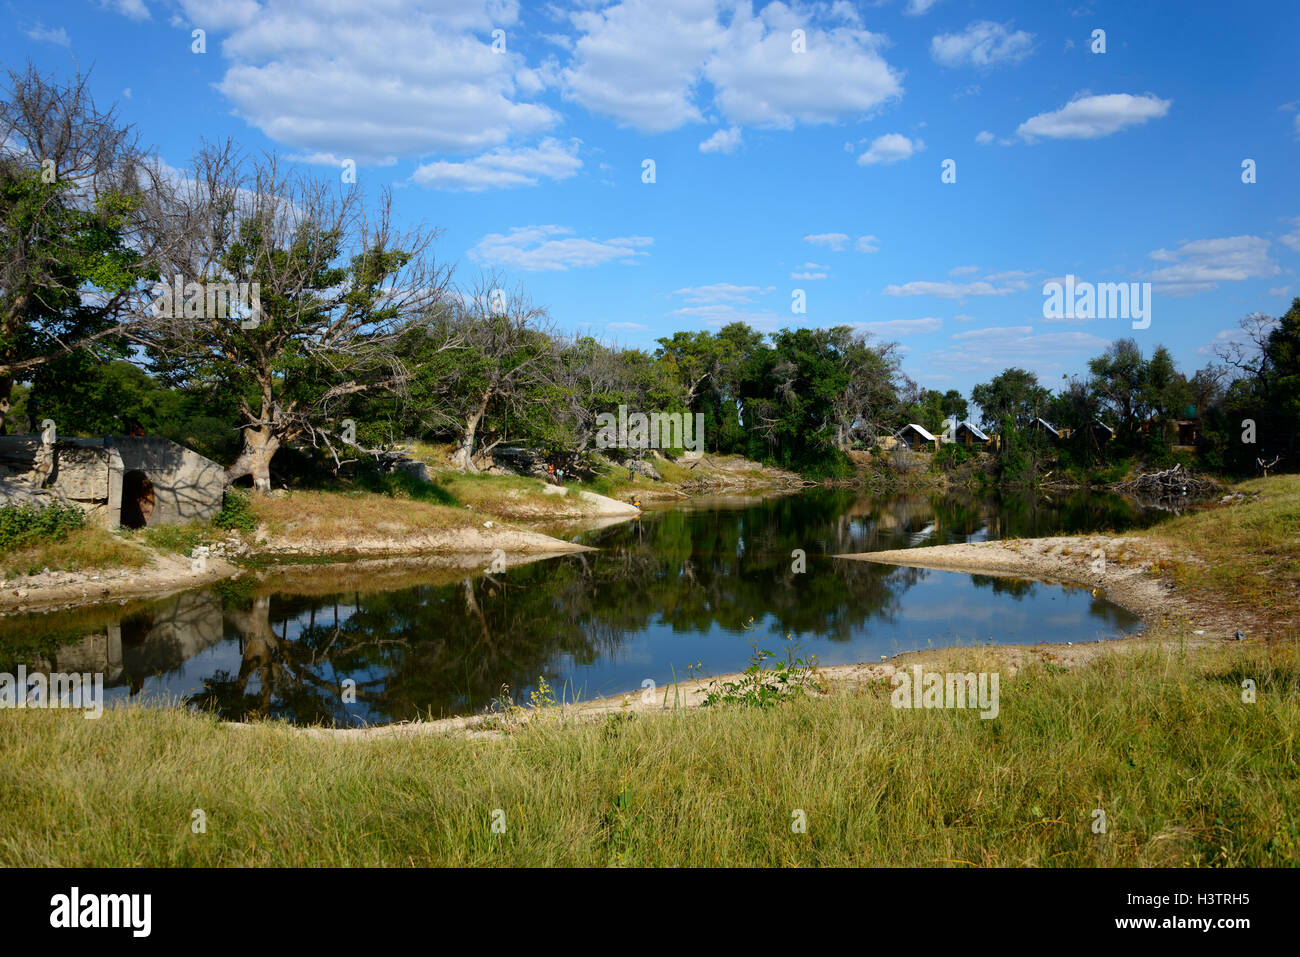 Thamalakane River, Maun, Botswana - Stock Image